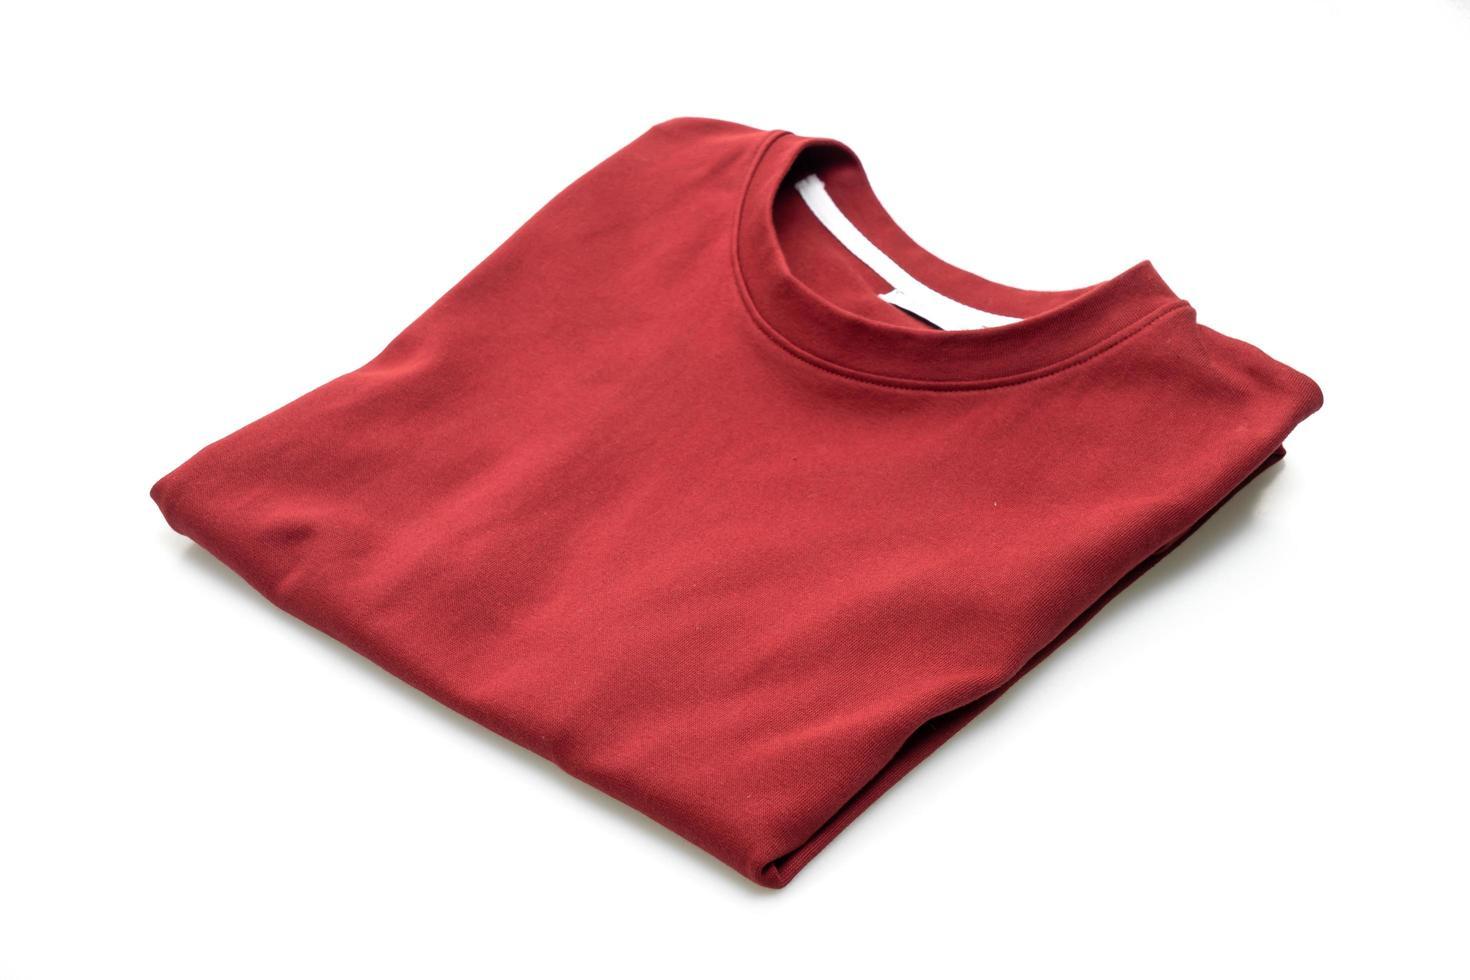 t-shirt piegata isolata su sfondo bianco foto